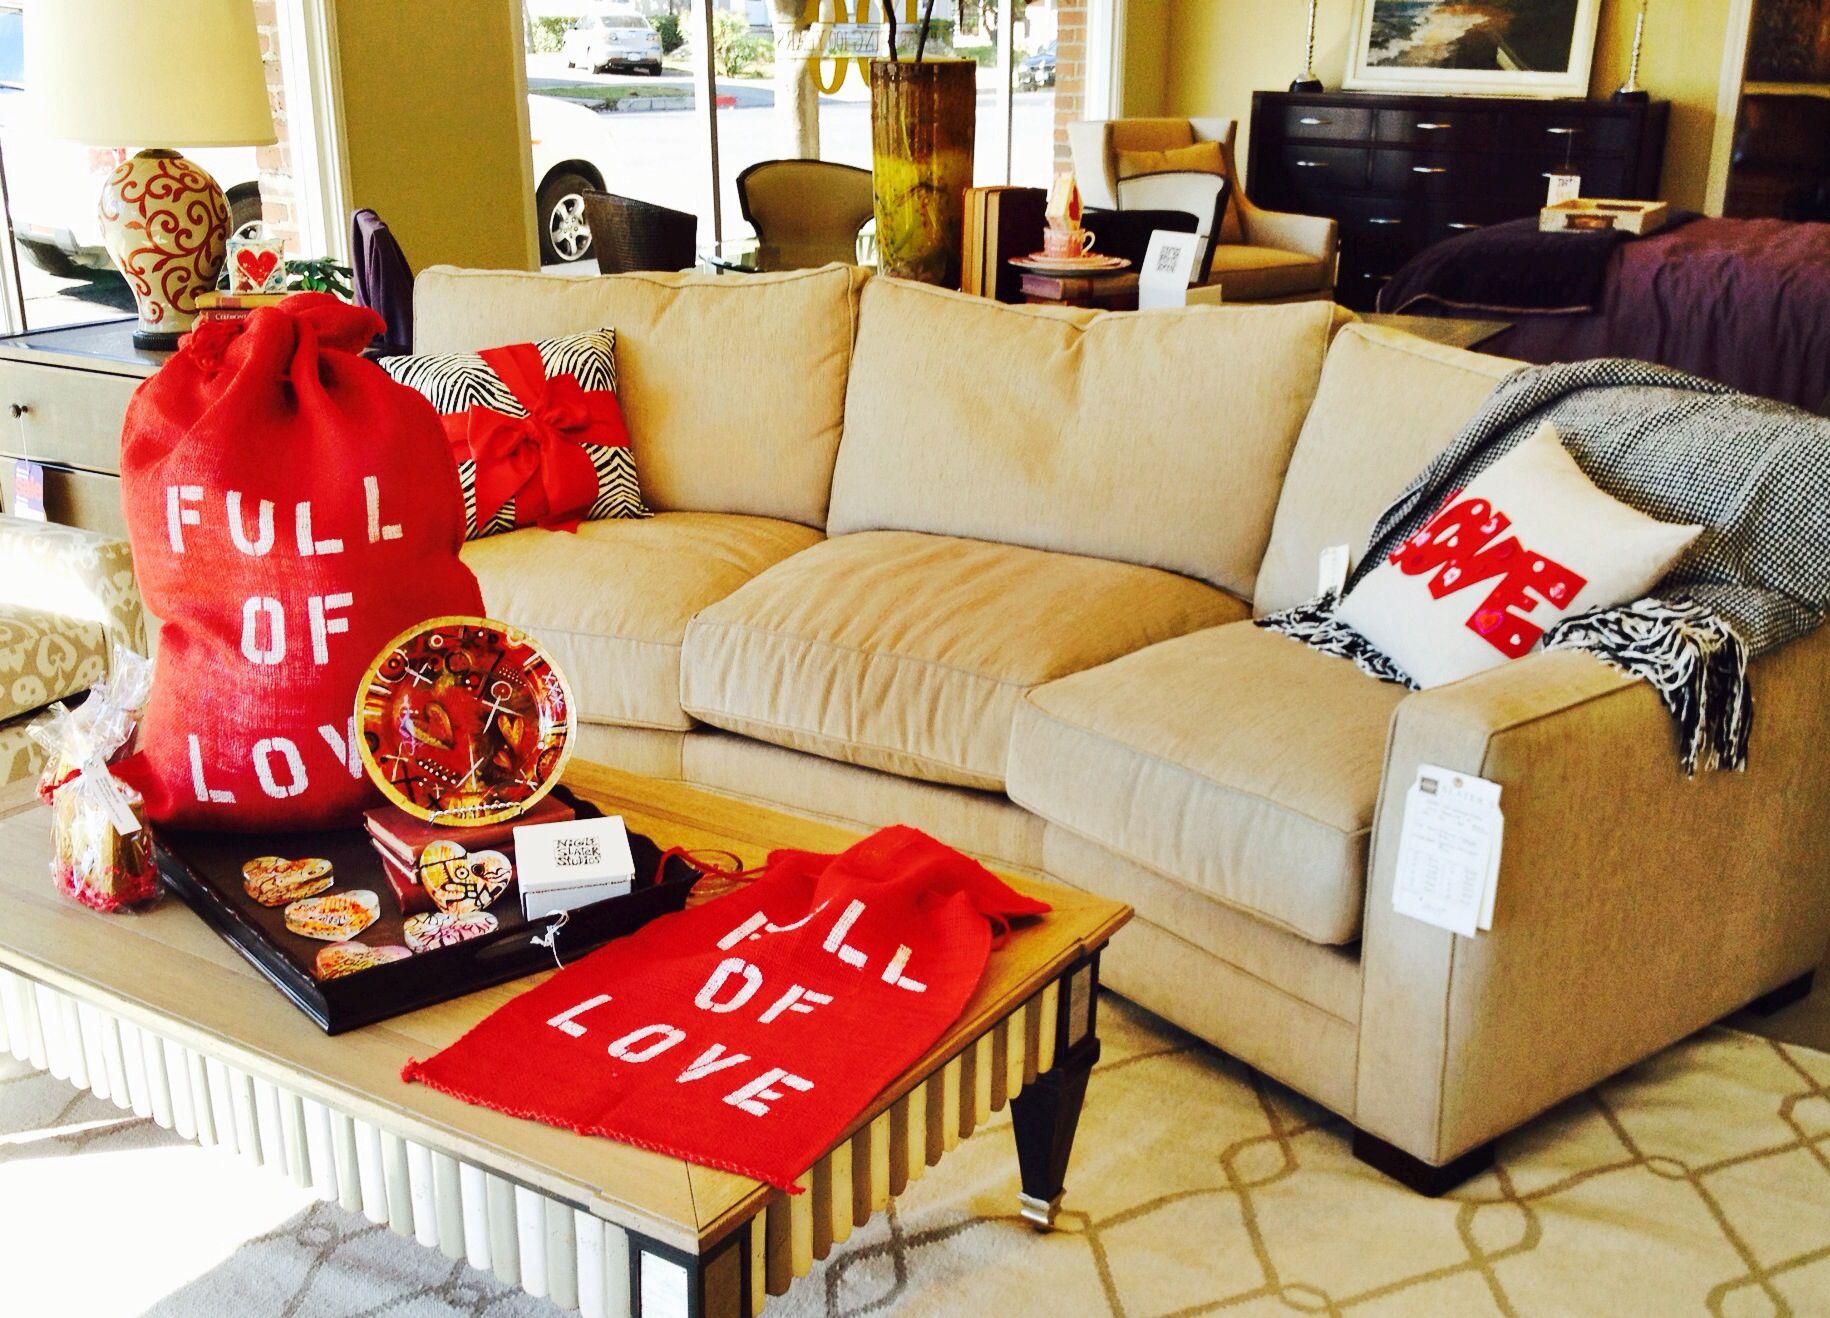 Wedge Conversation Sofa Bar Room Decor Living Dining Room Furniture